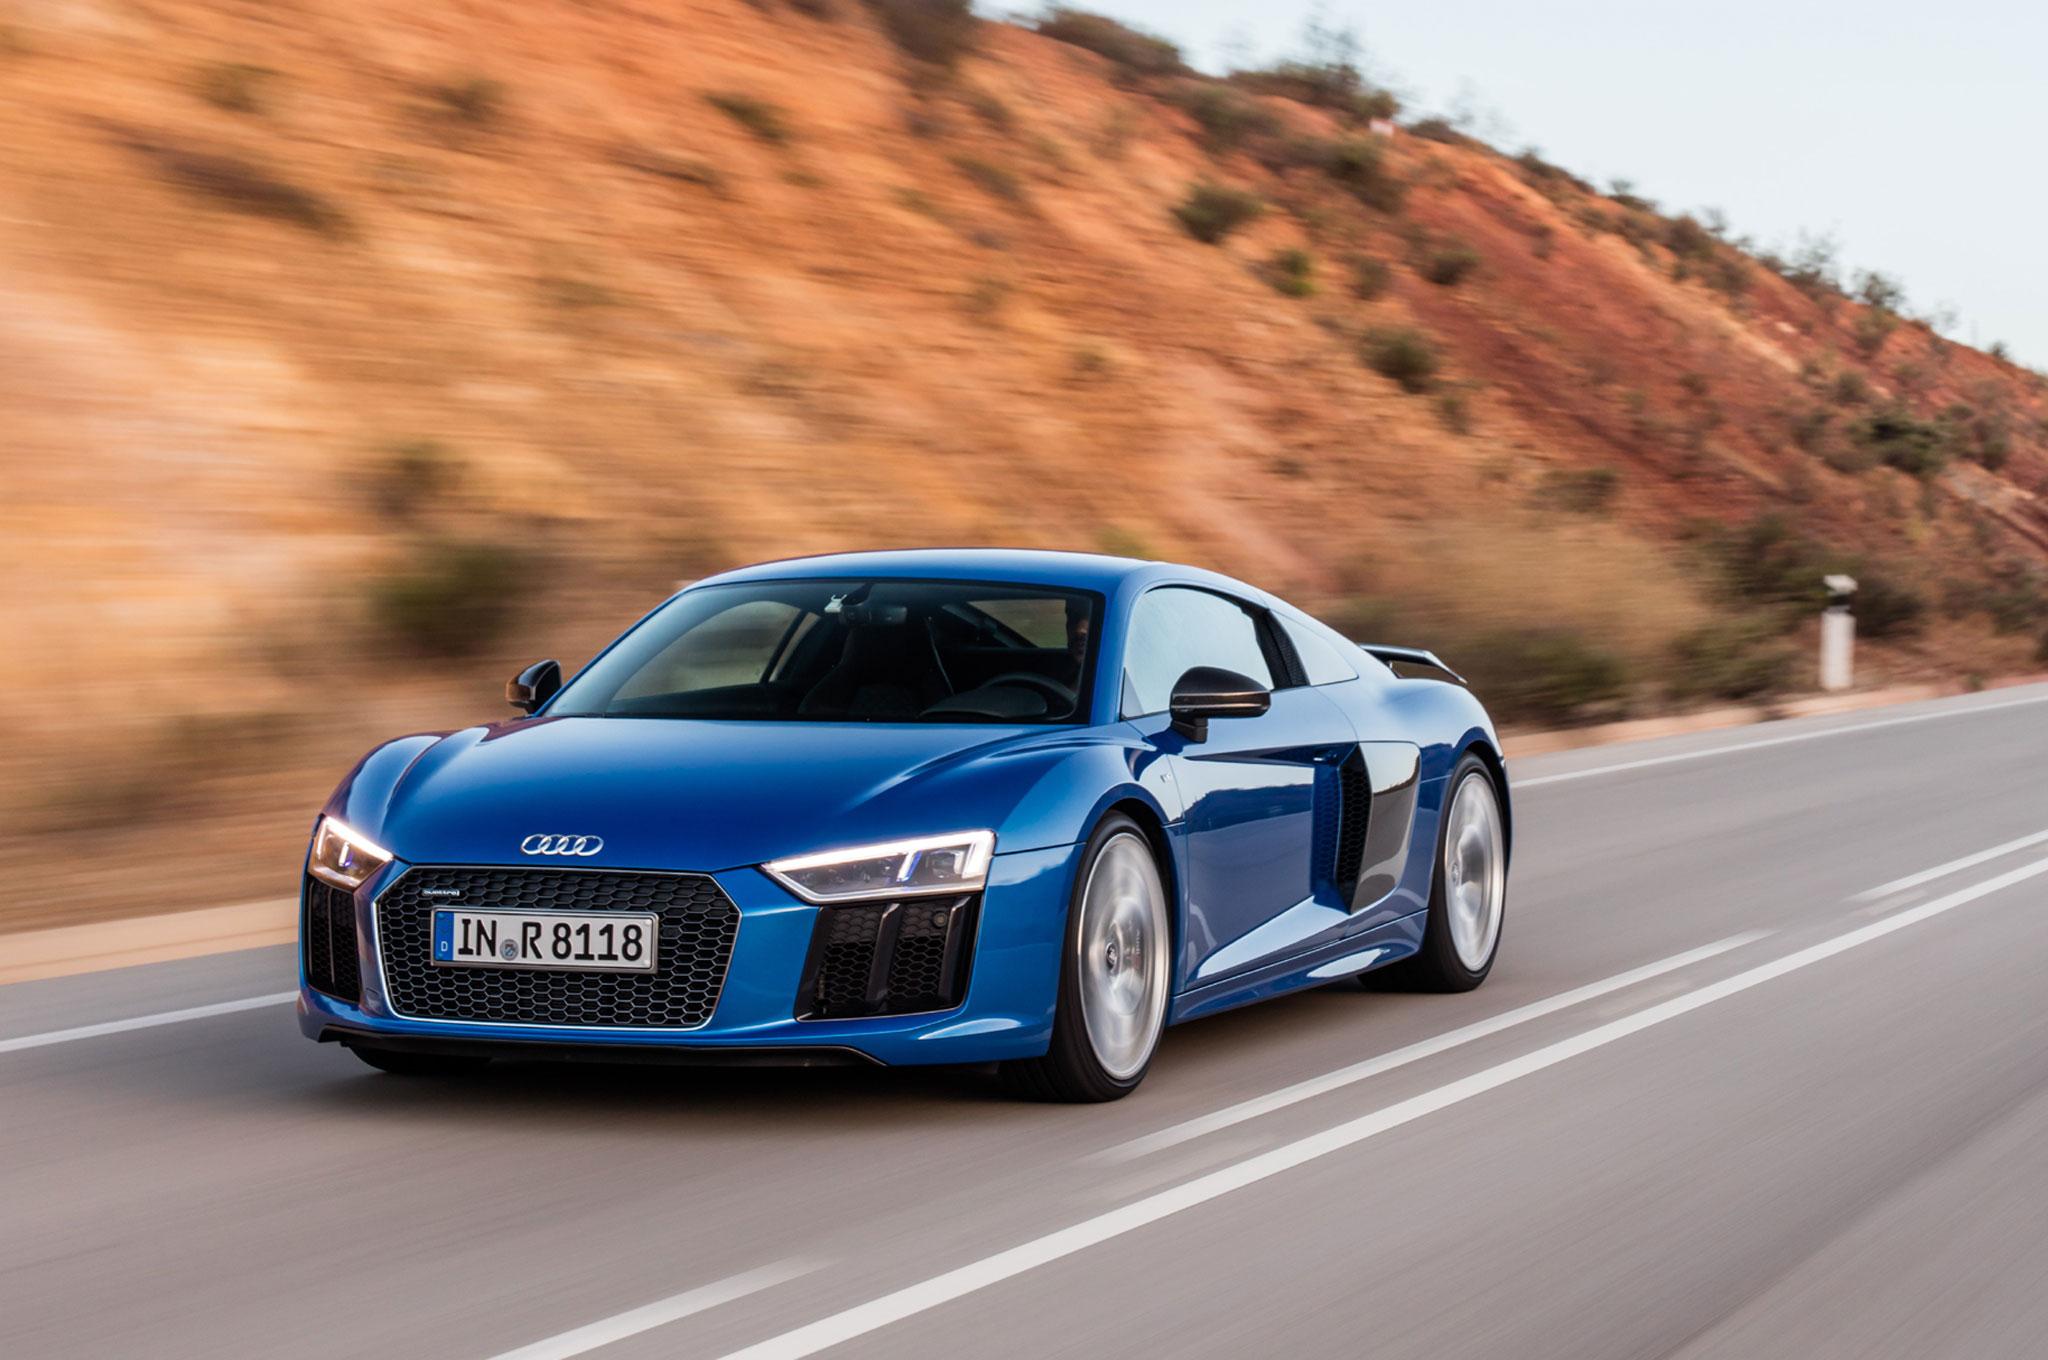 Elegant 2017 Audi R8 V10 Plus Front Three Quarter In Motion 02